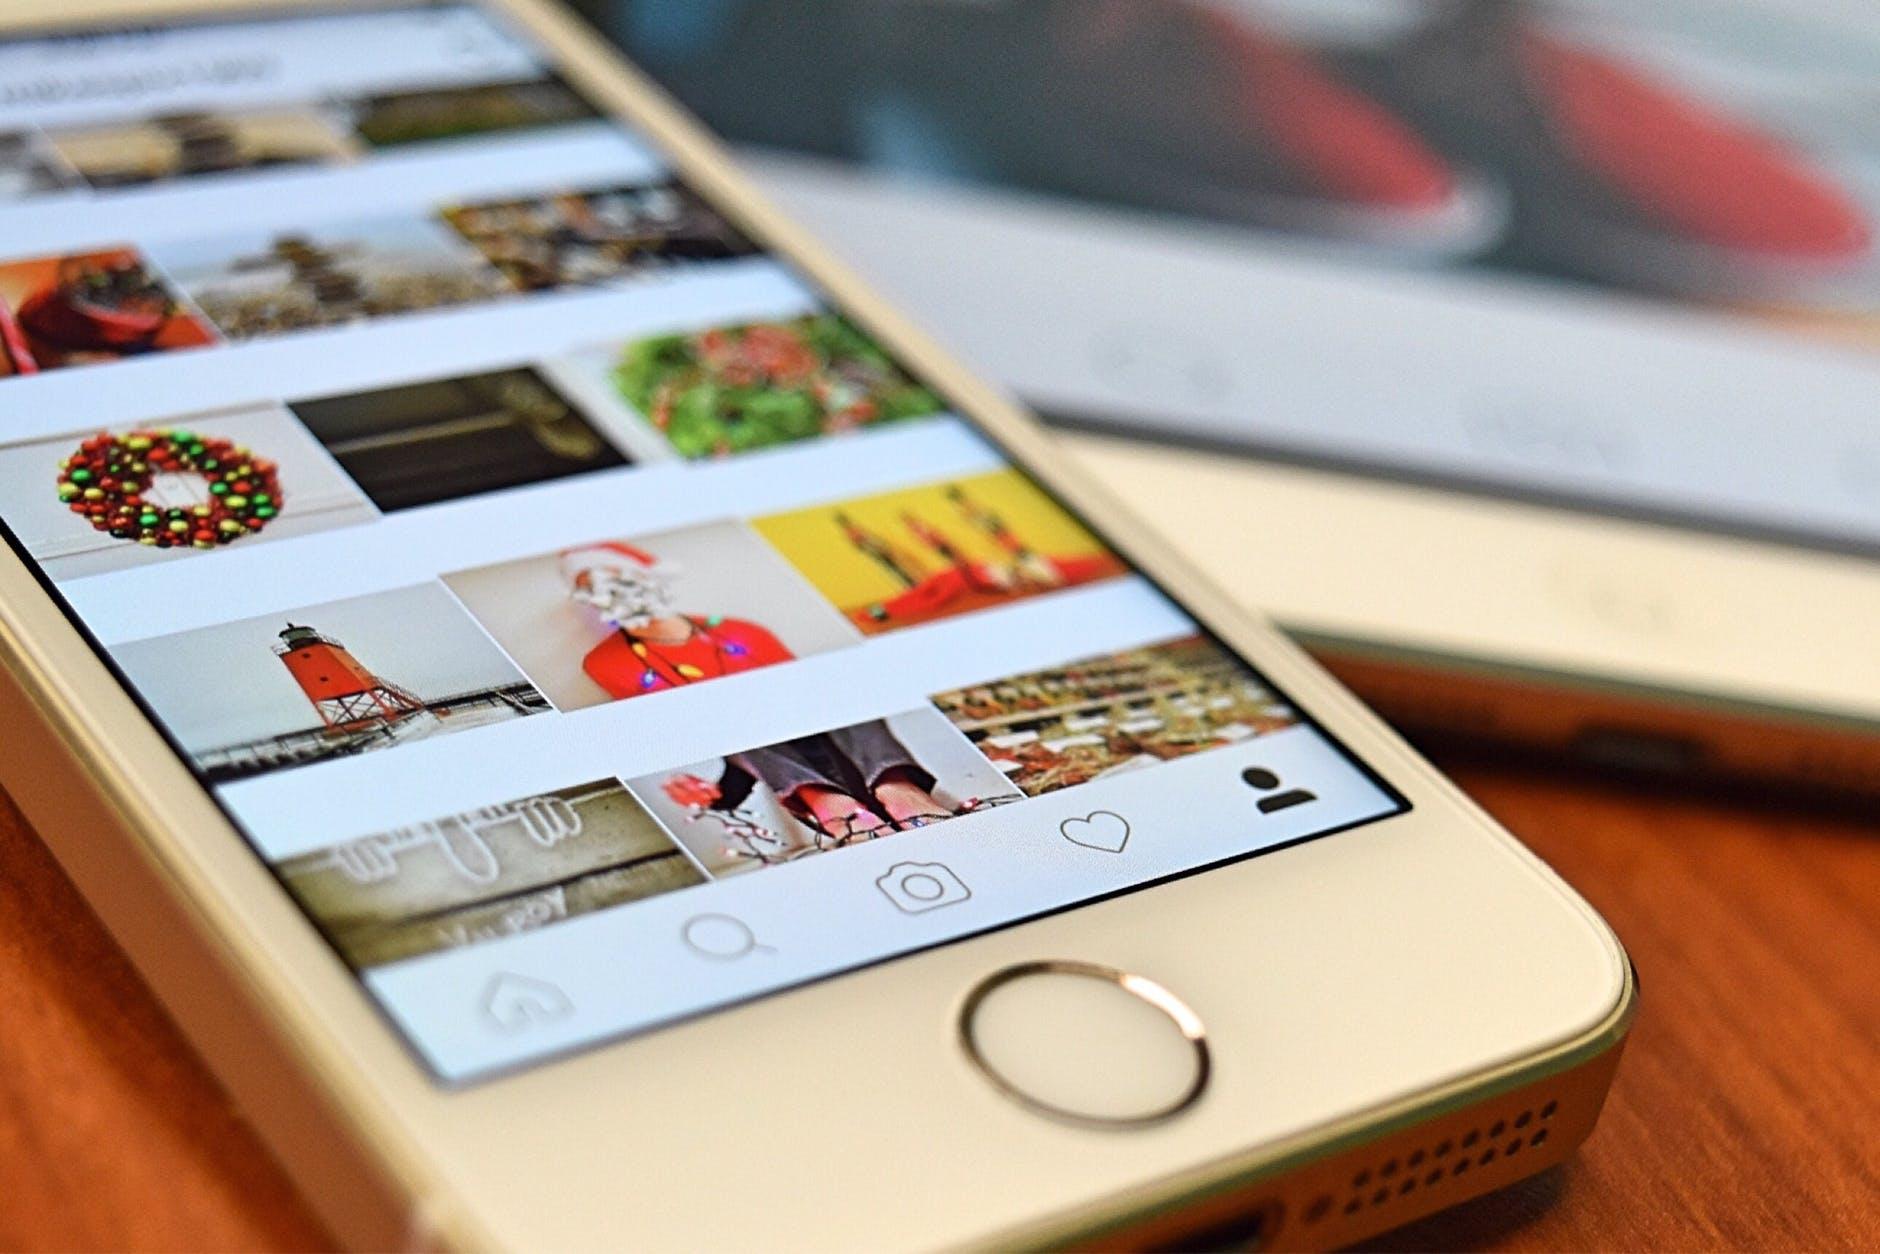 instagram-cell-phone-tablet-device-163148.jpg